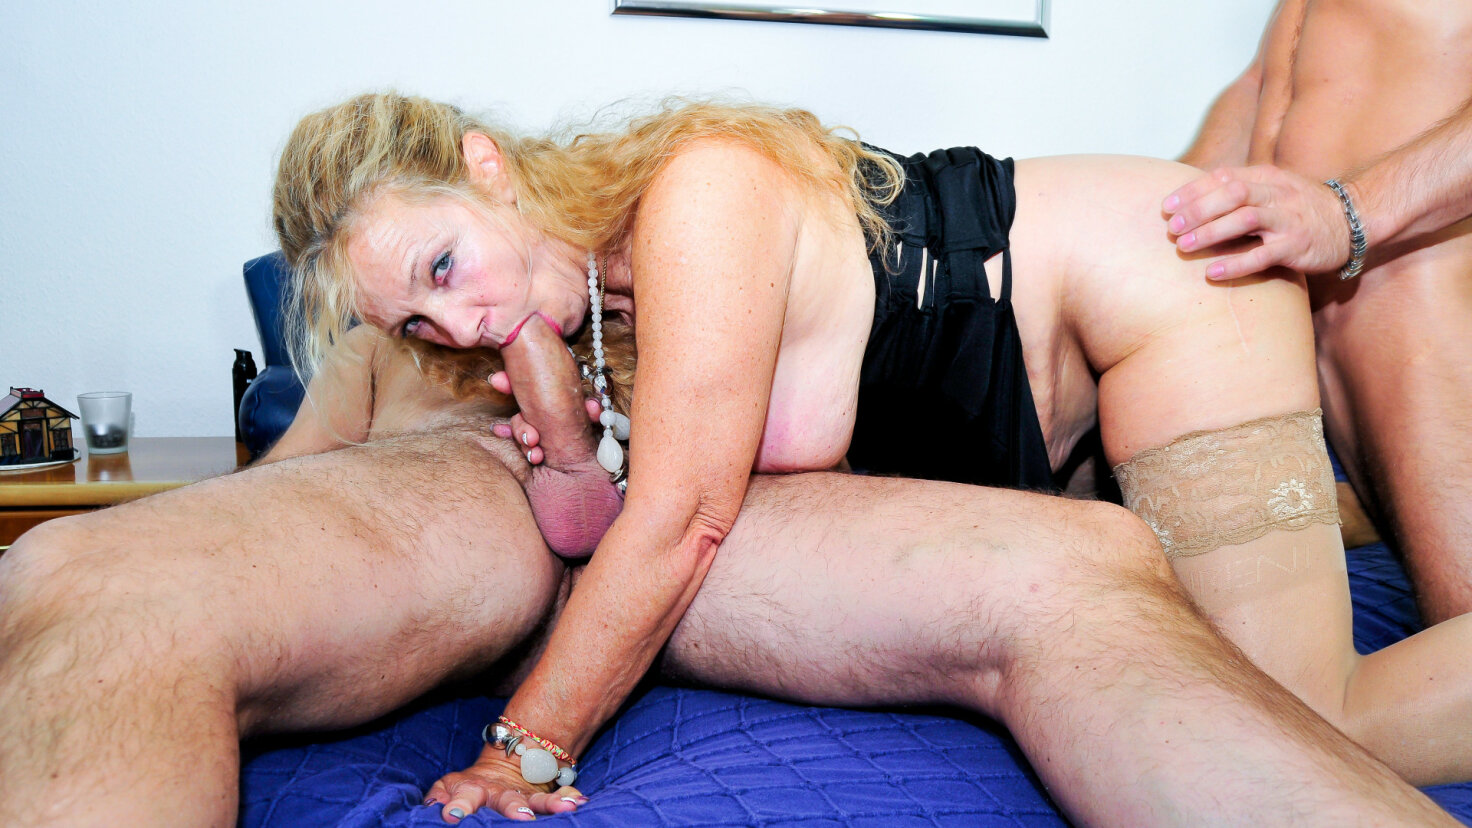 Mature blondie fucked hard in German threesome